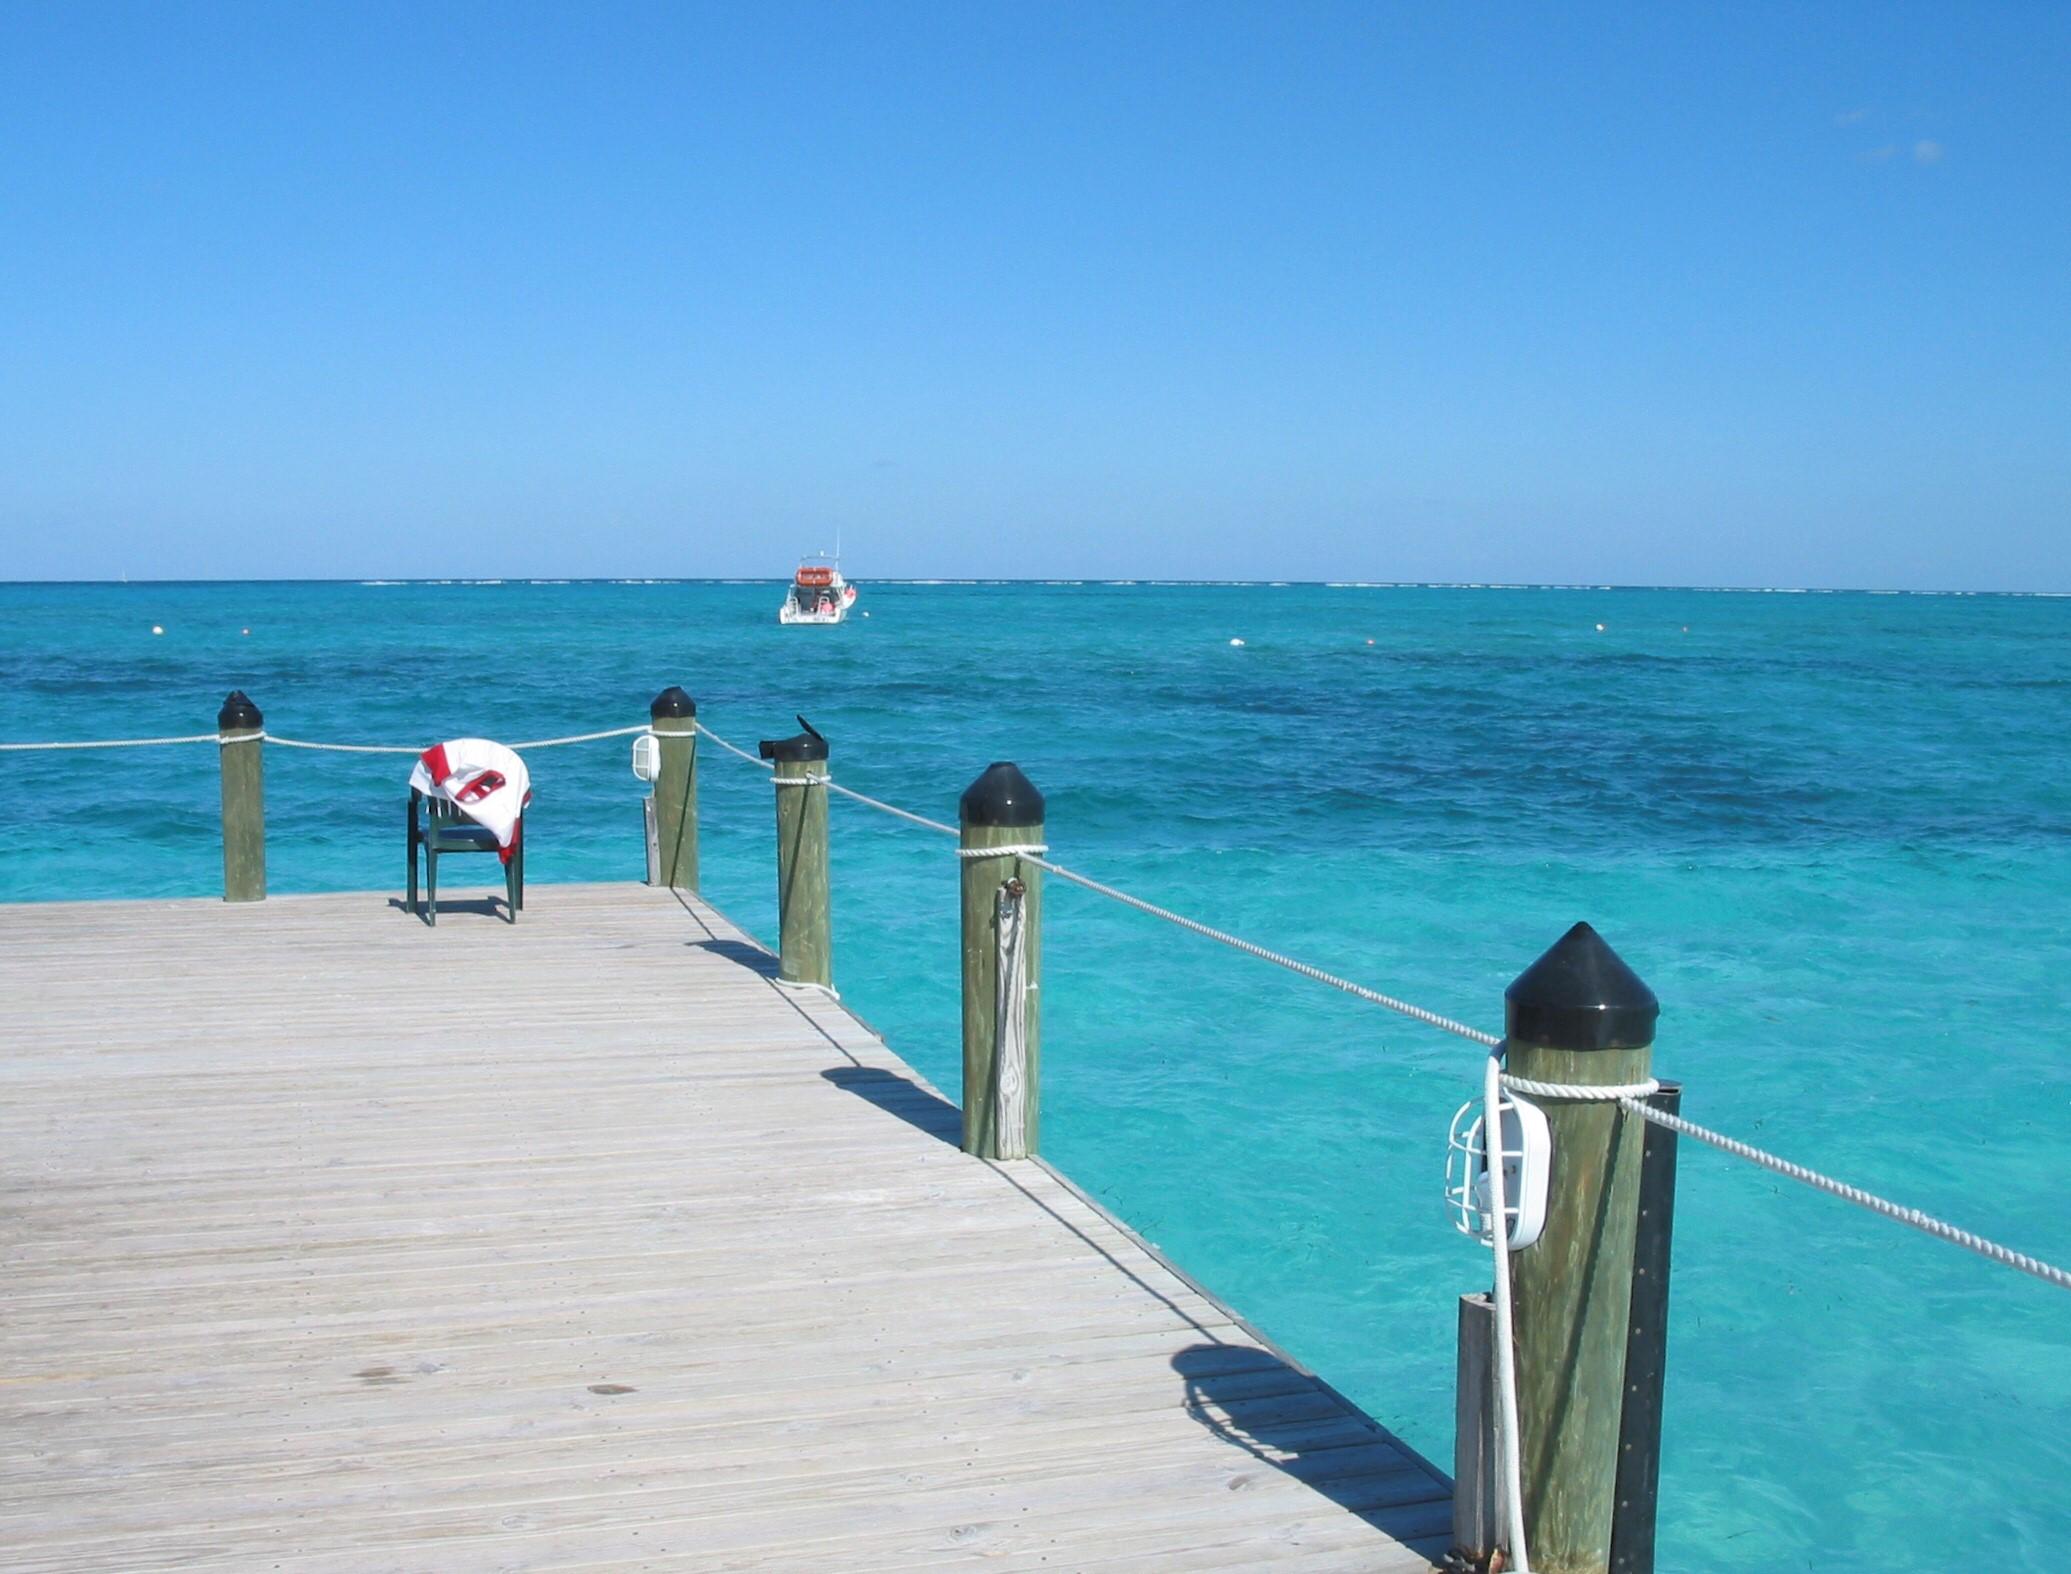 beaches-turks-and-caicos.jpg